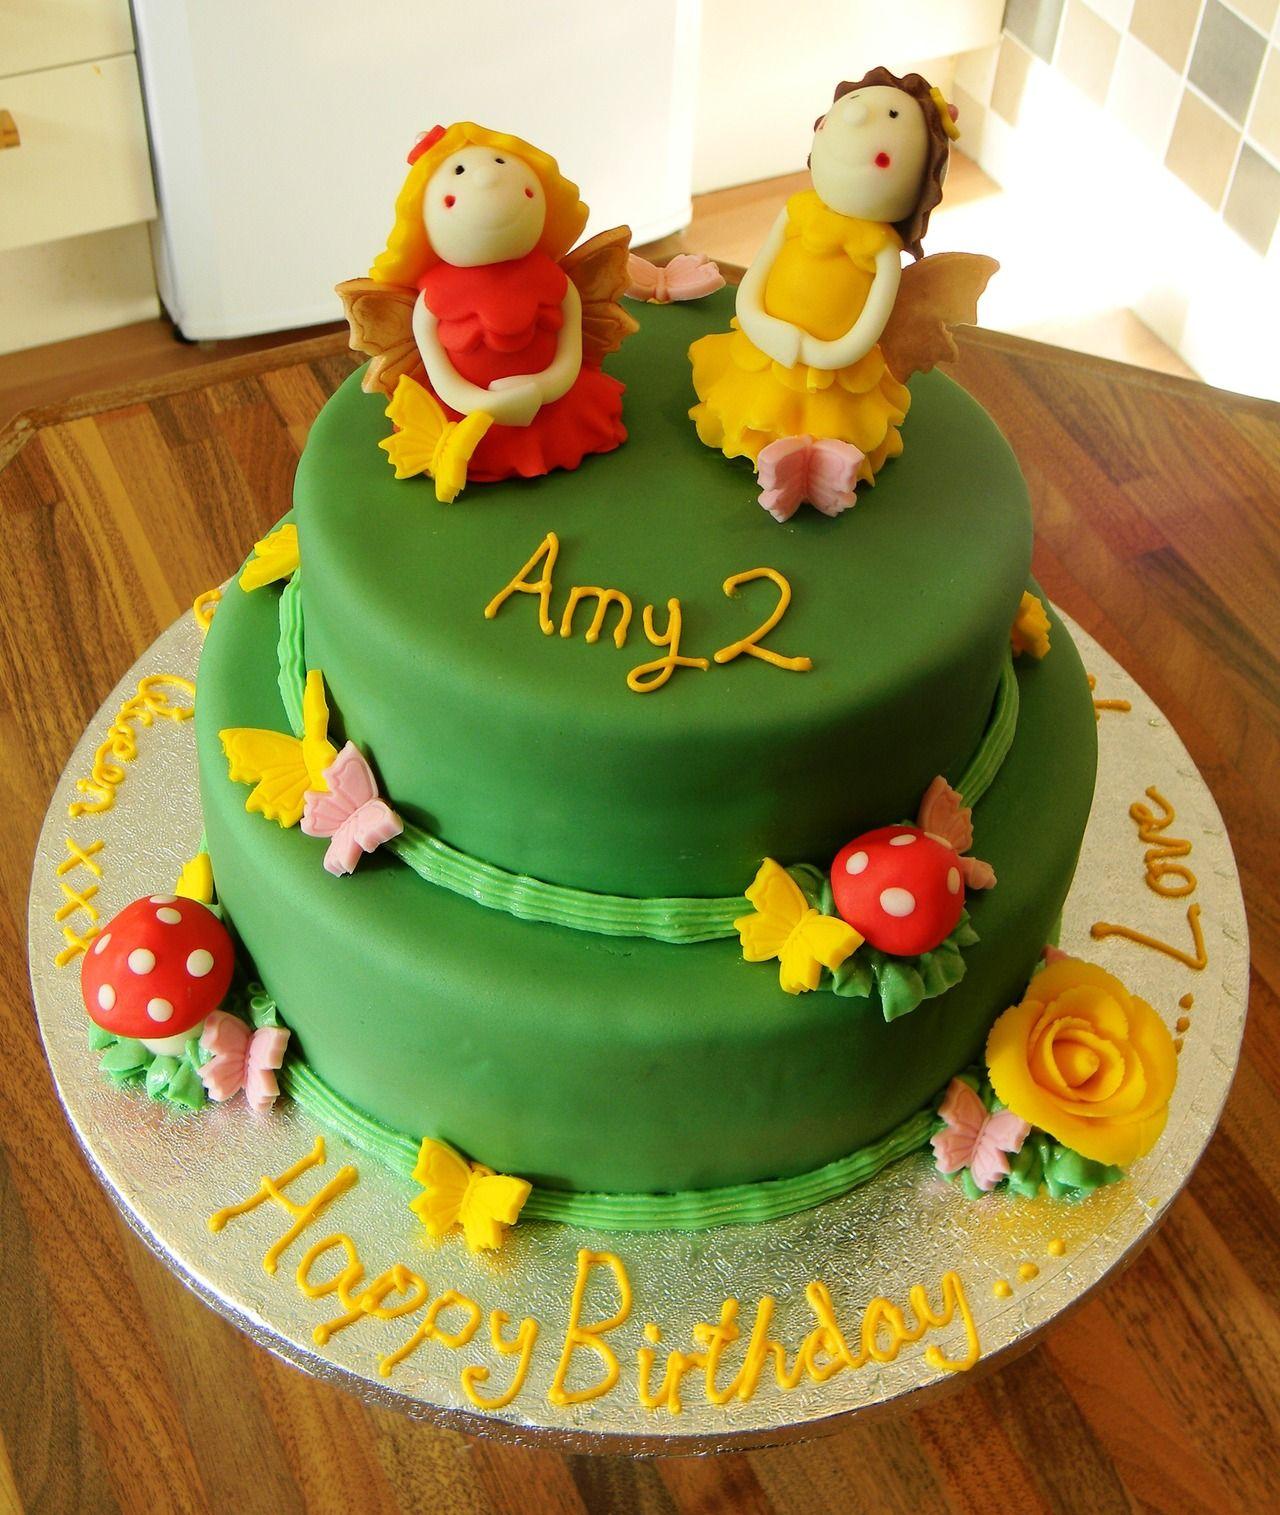 I ♥ CAKE Butterflies and Fairies Cake